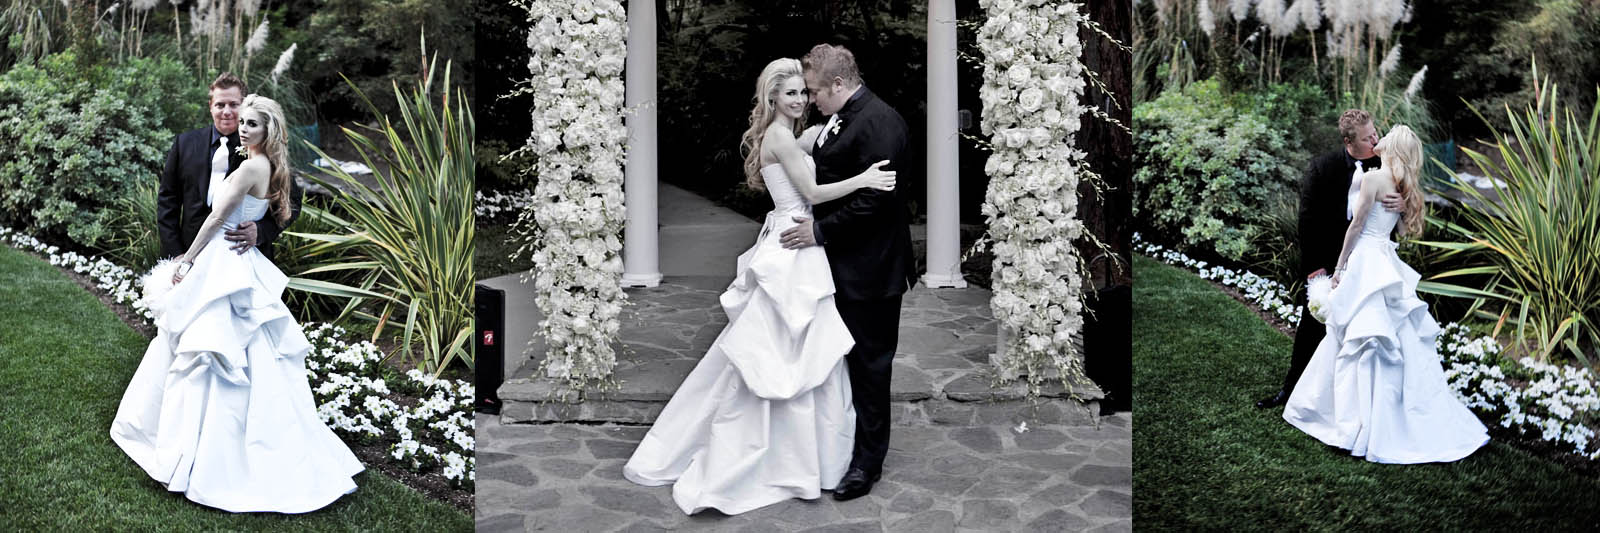 La Photography Services Top Wedding Photographer